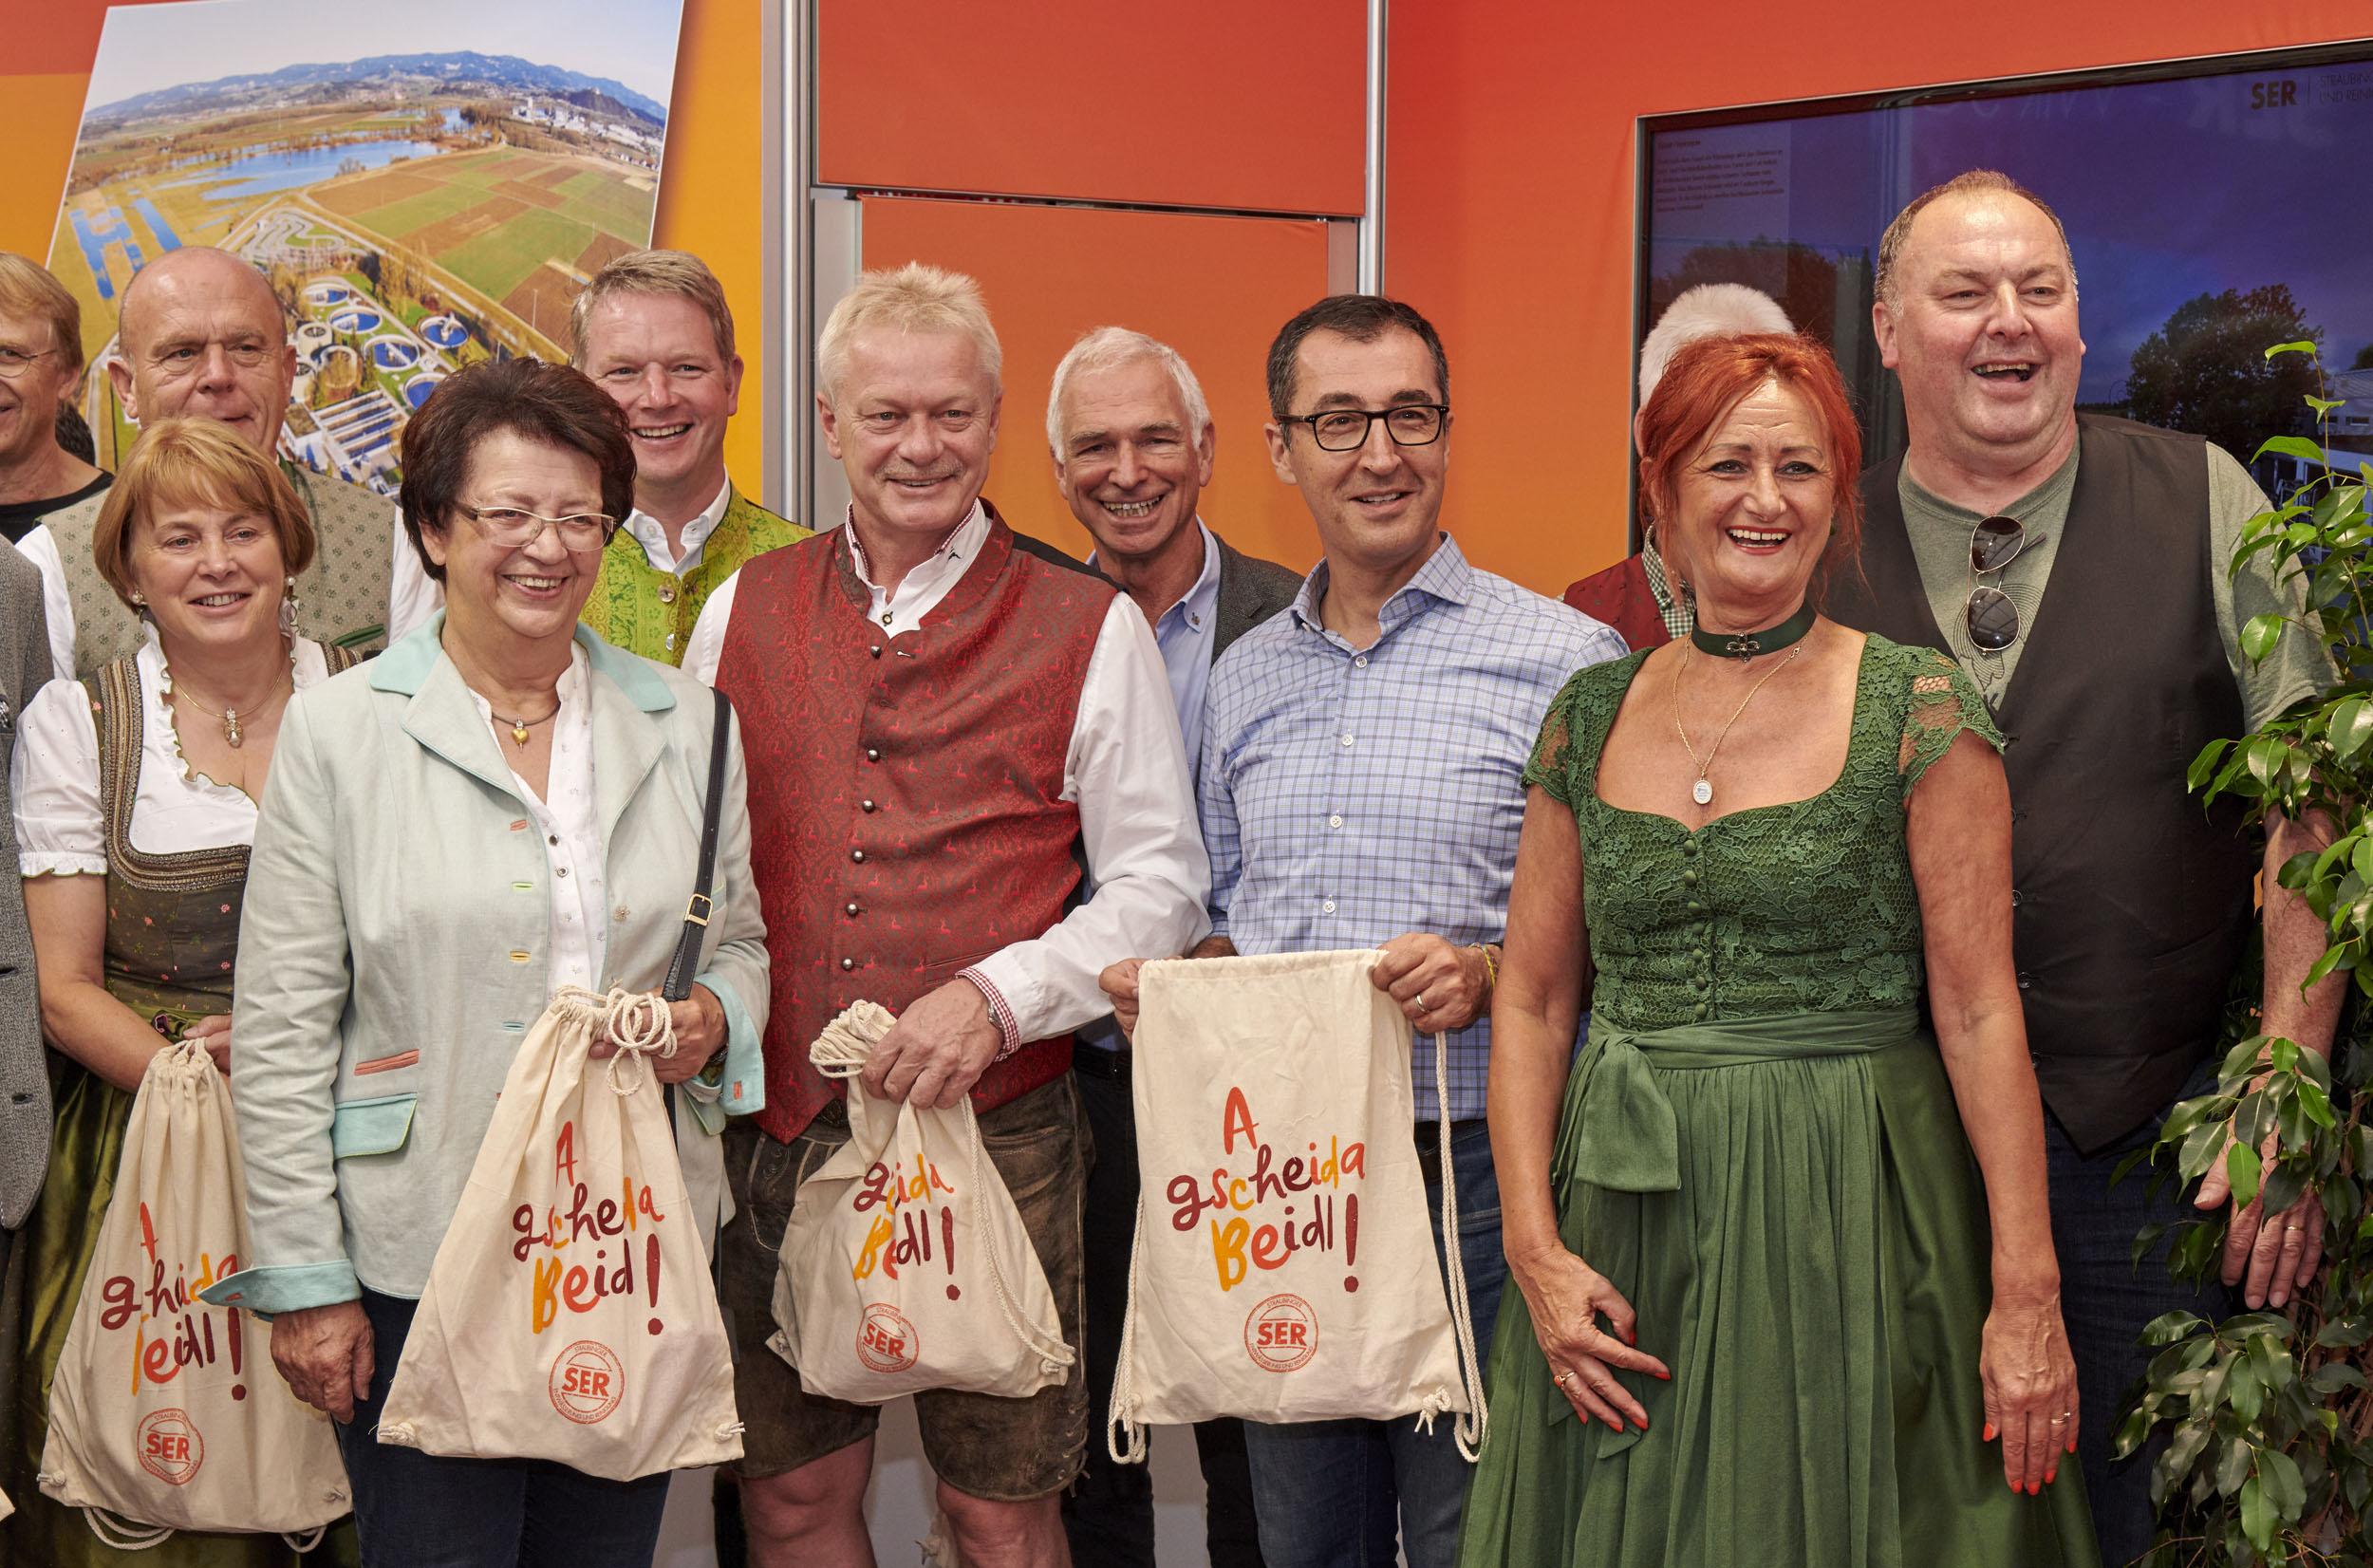 SER Ostbayernschau 2019